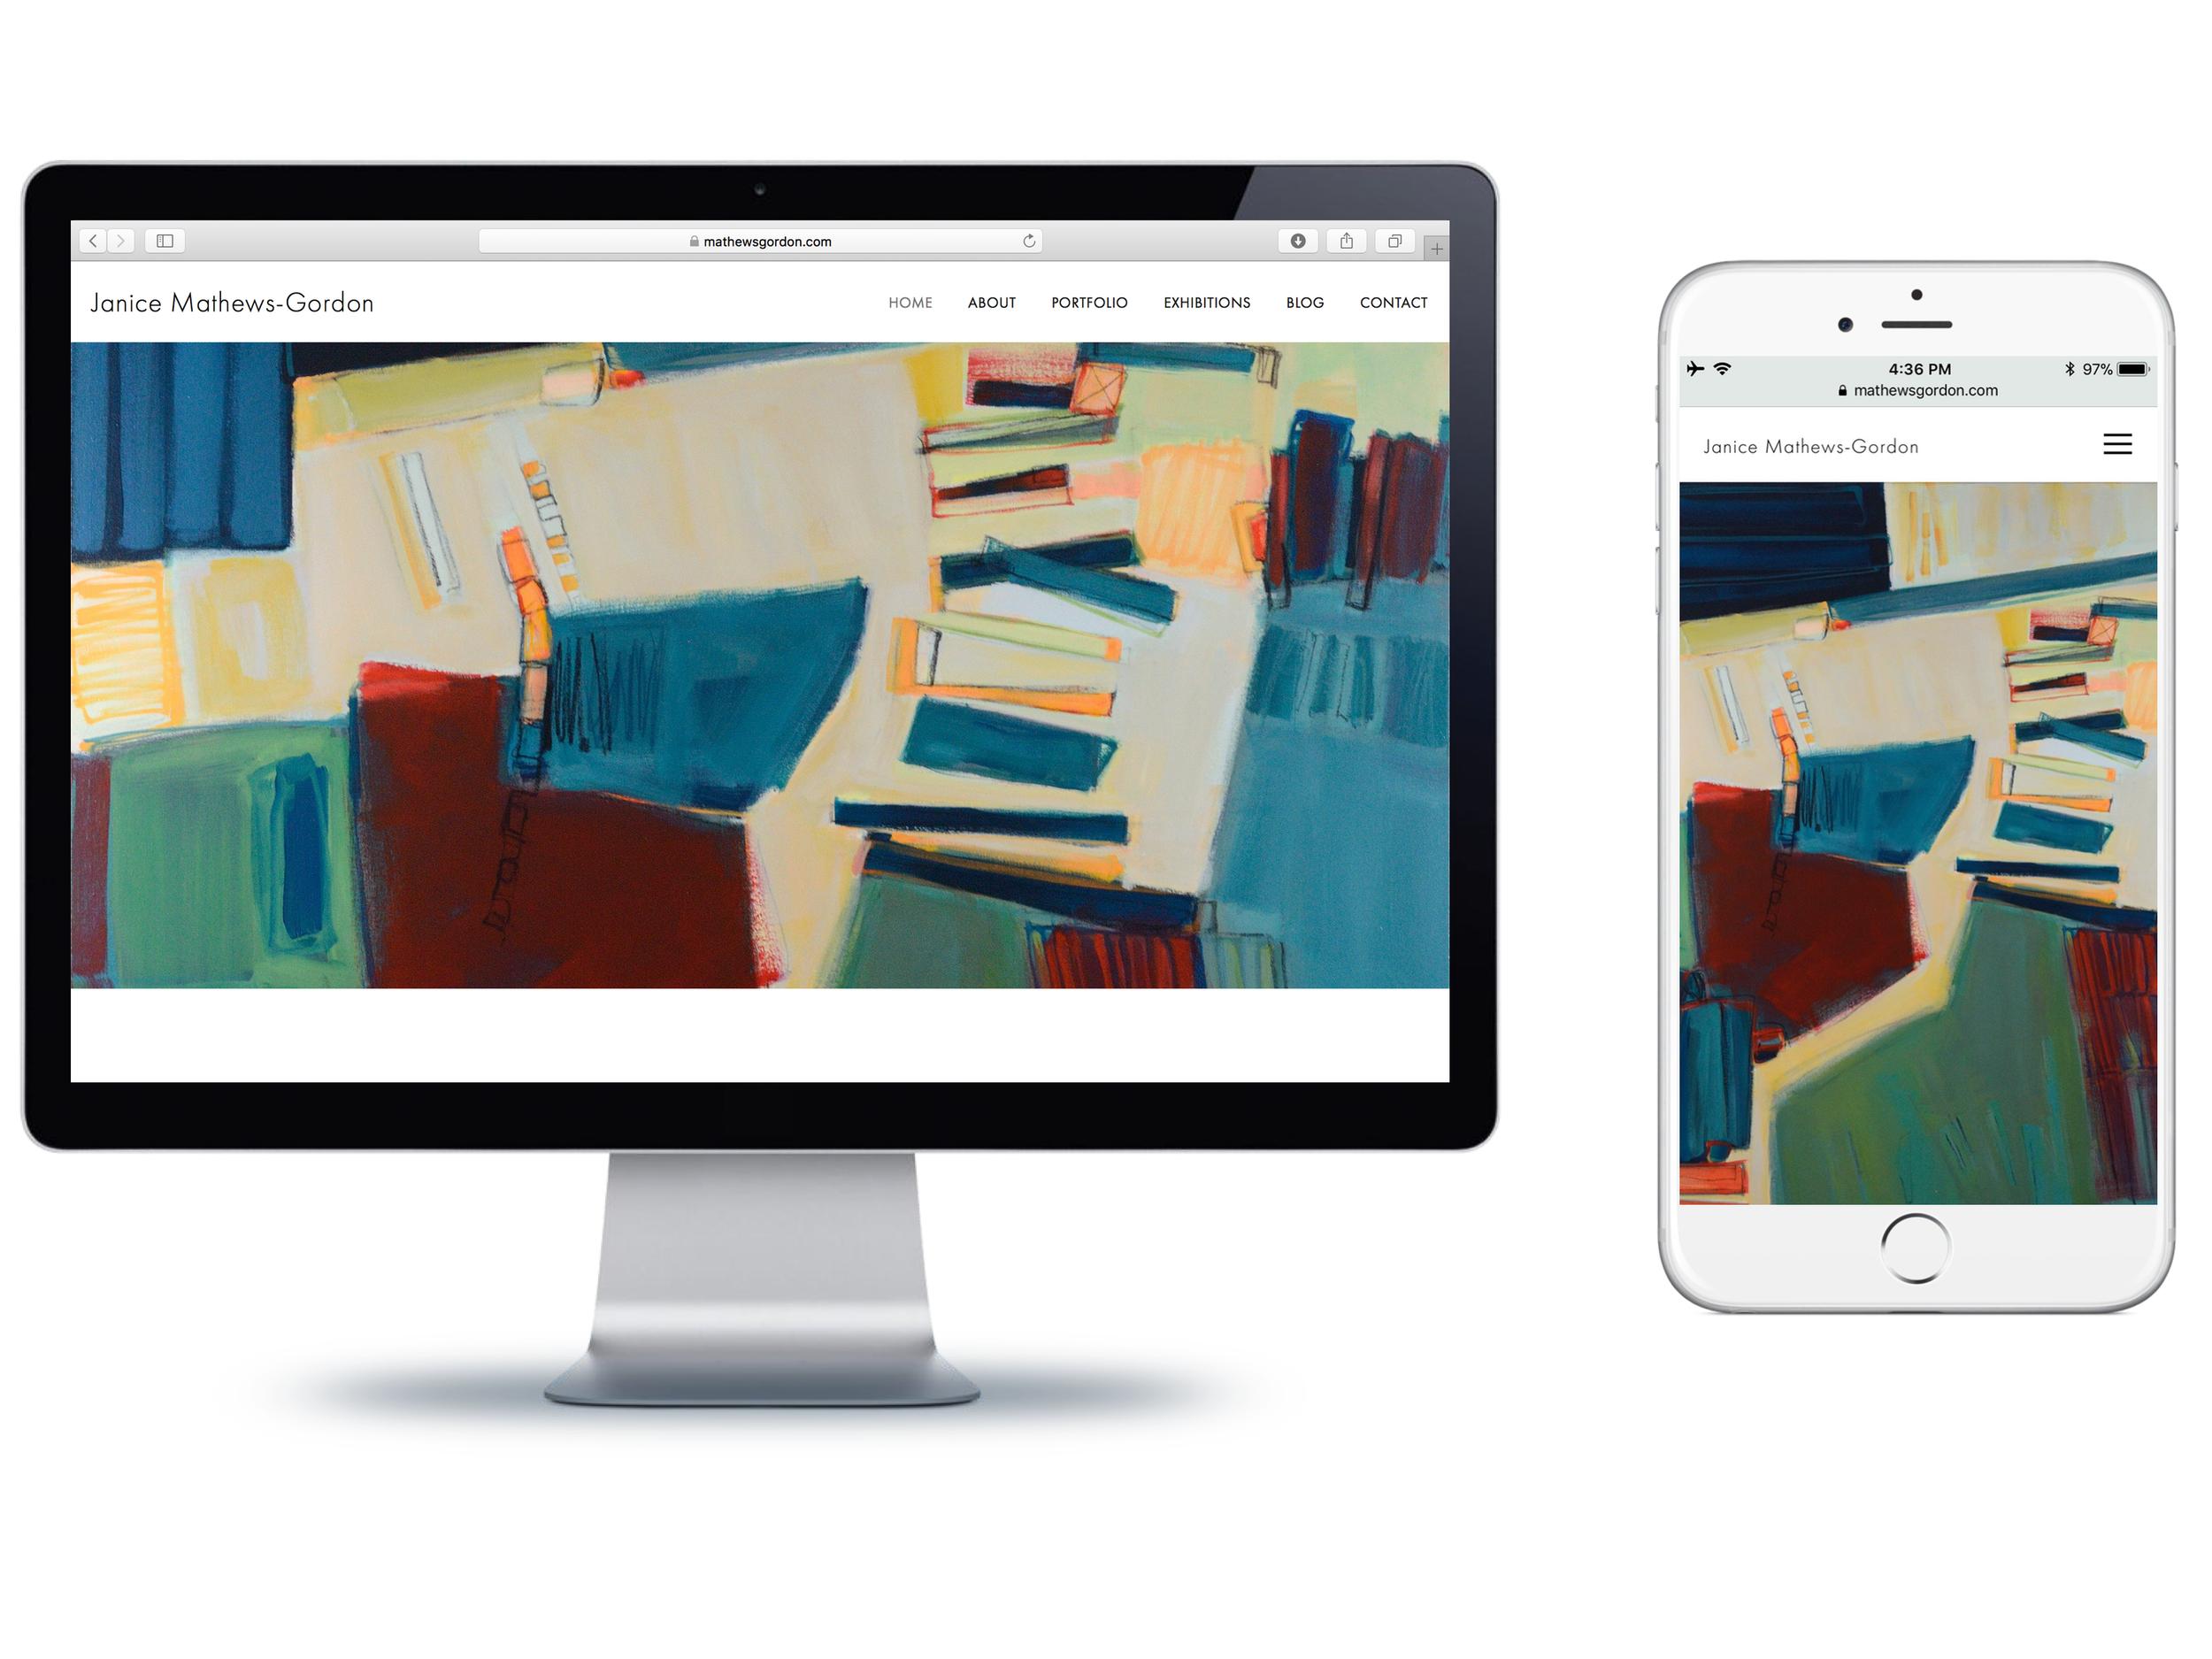 jmg art web ss (updated).png